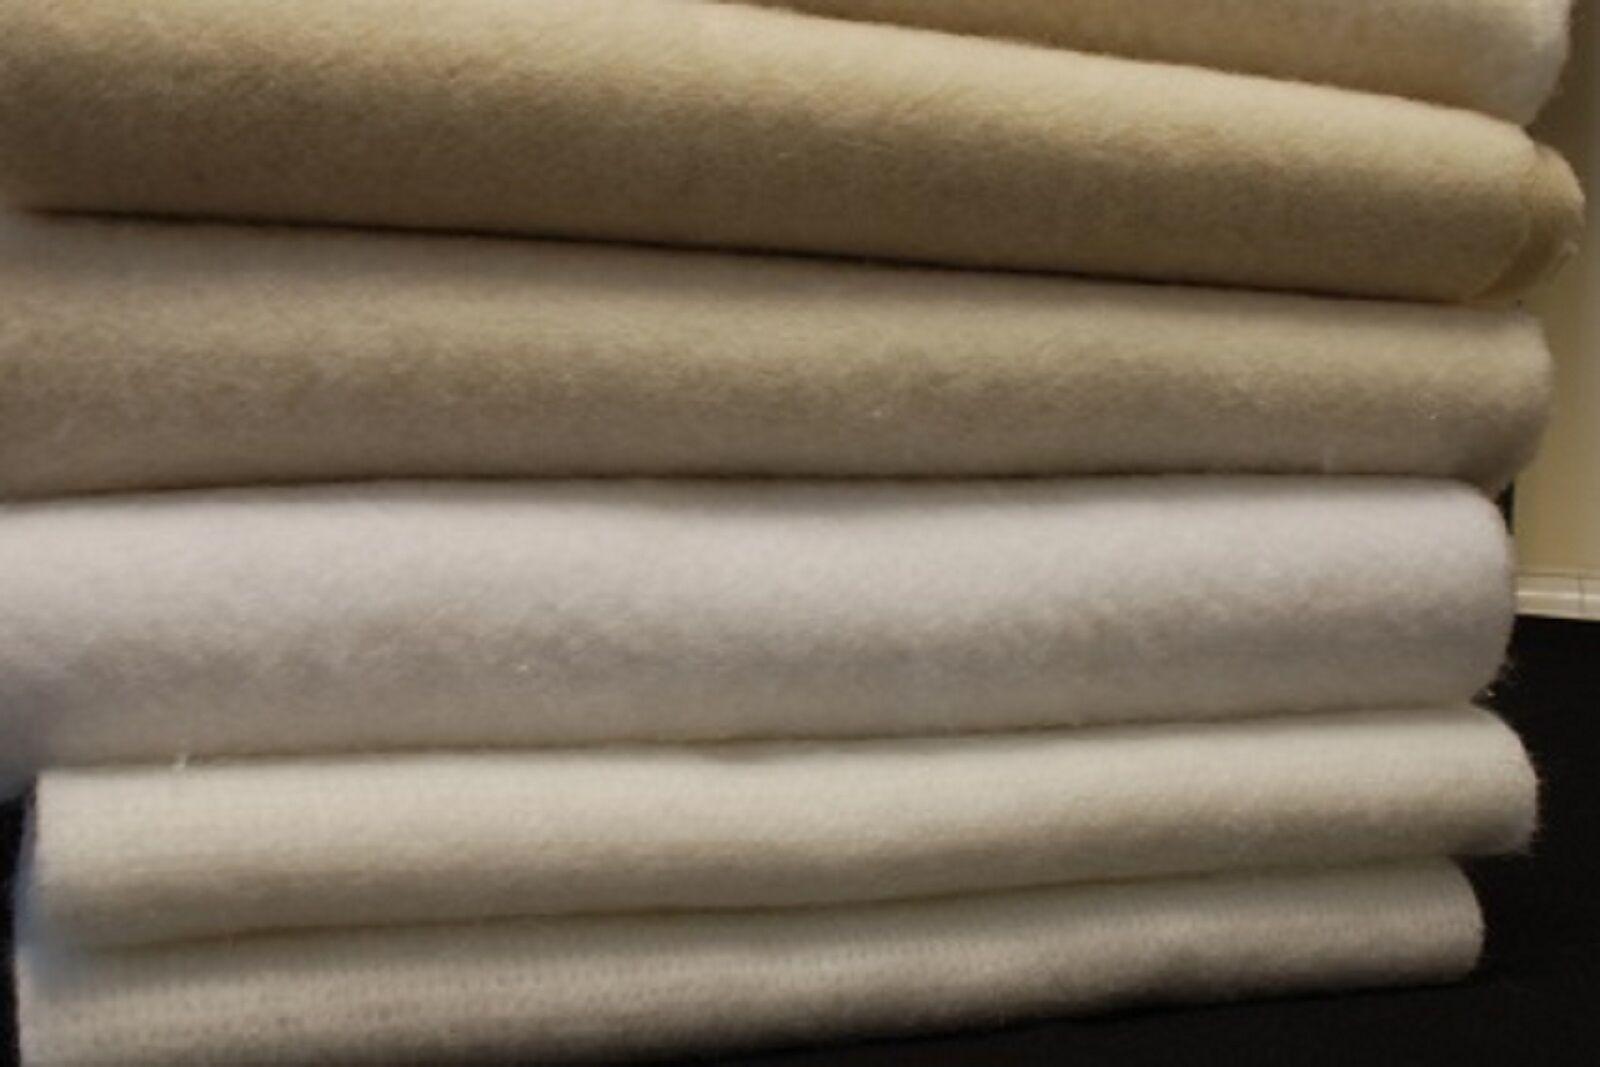 Domette Bump Interlining Curtain Lining Fabric 54 Quot 137cm